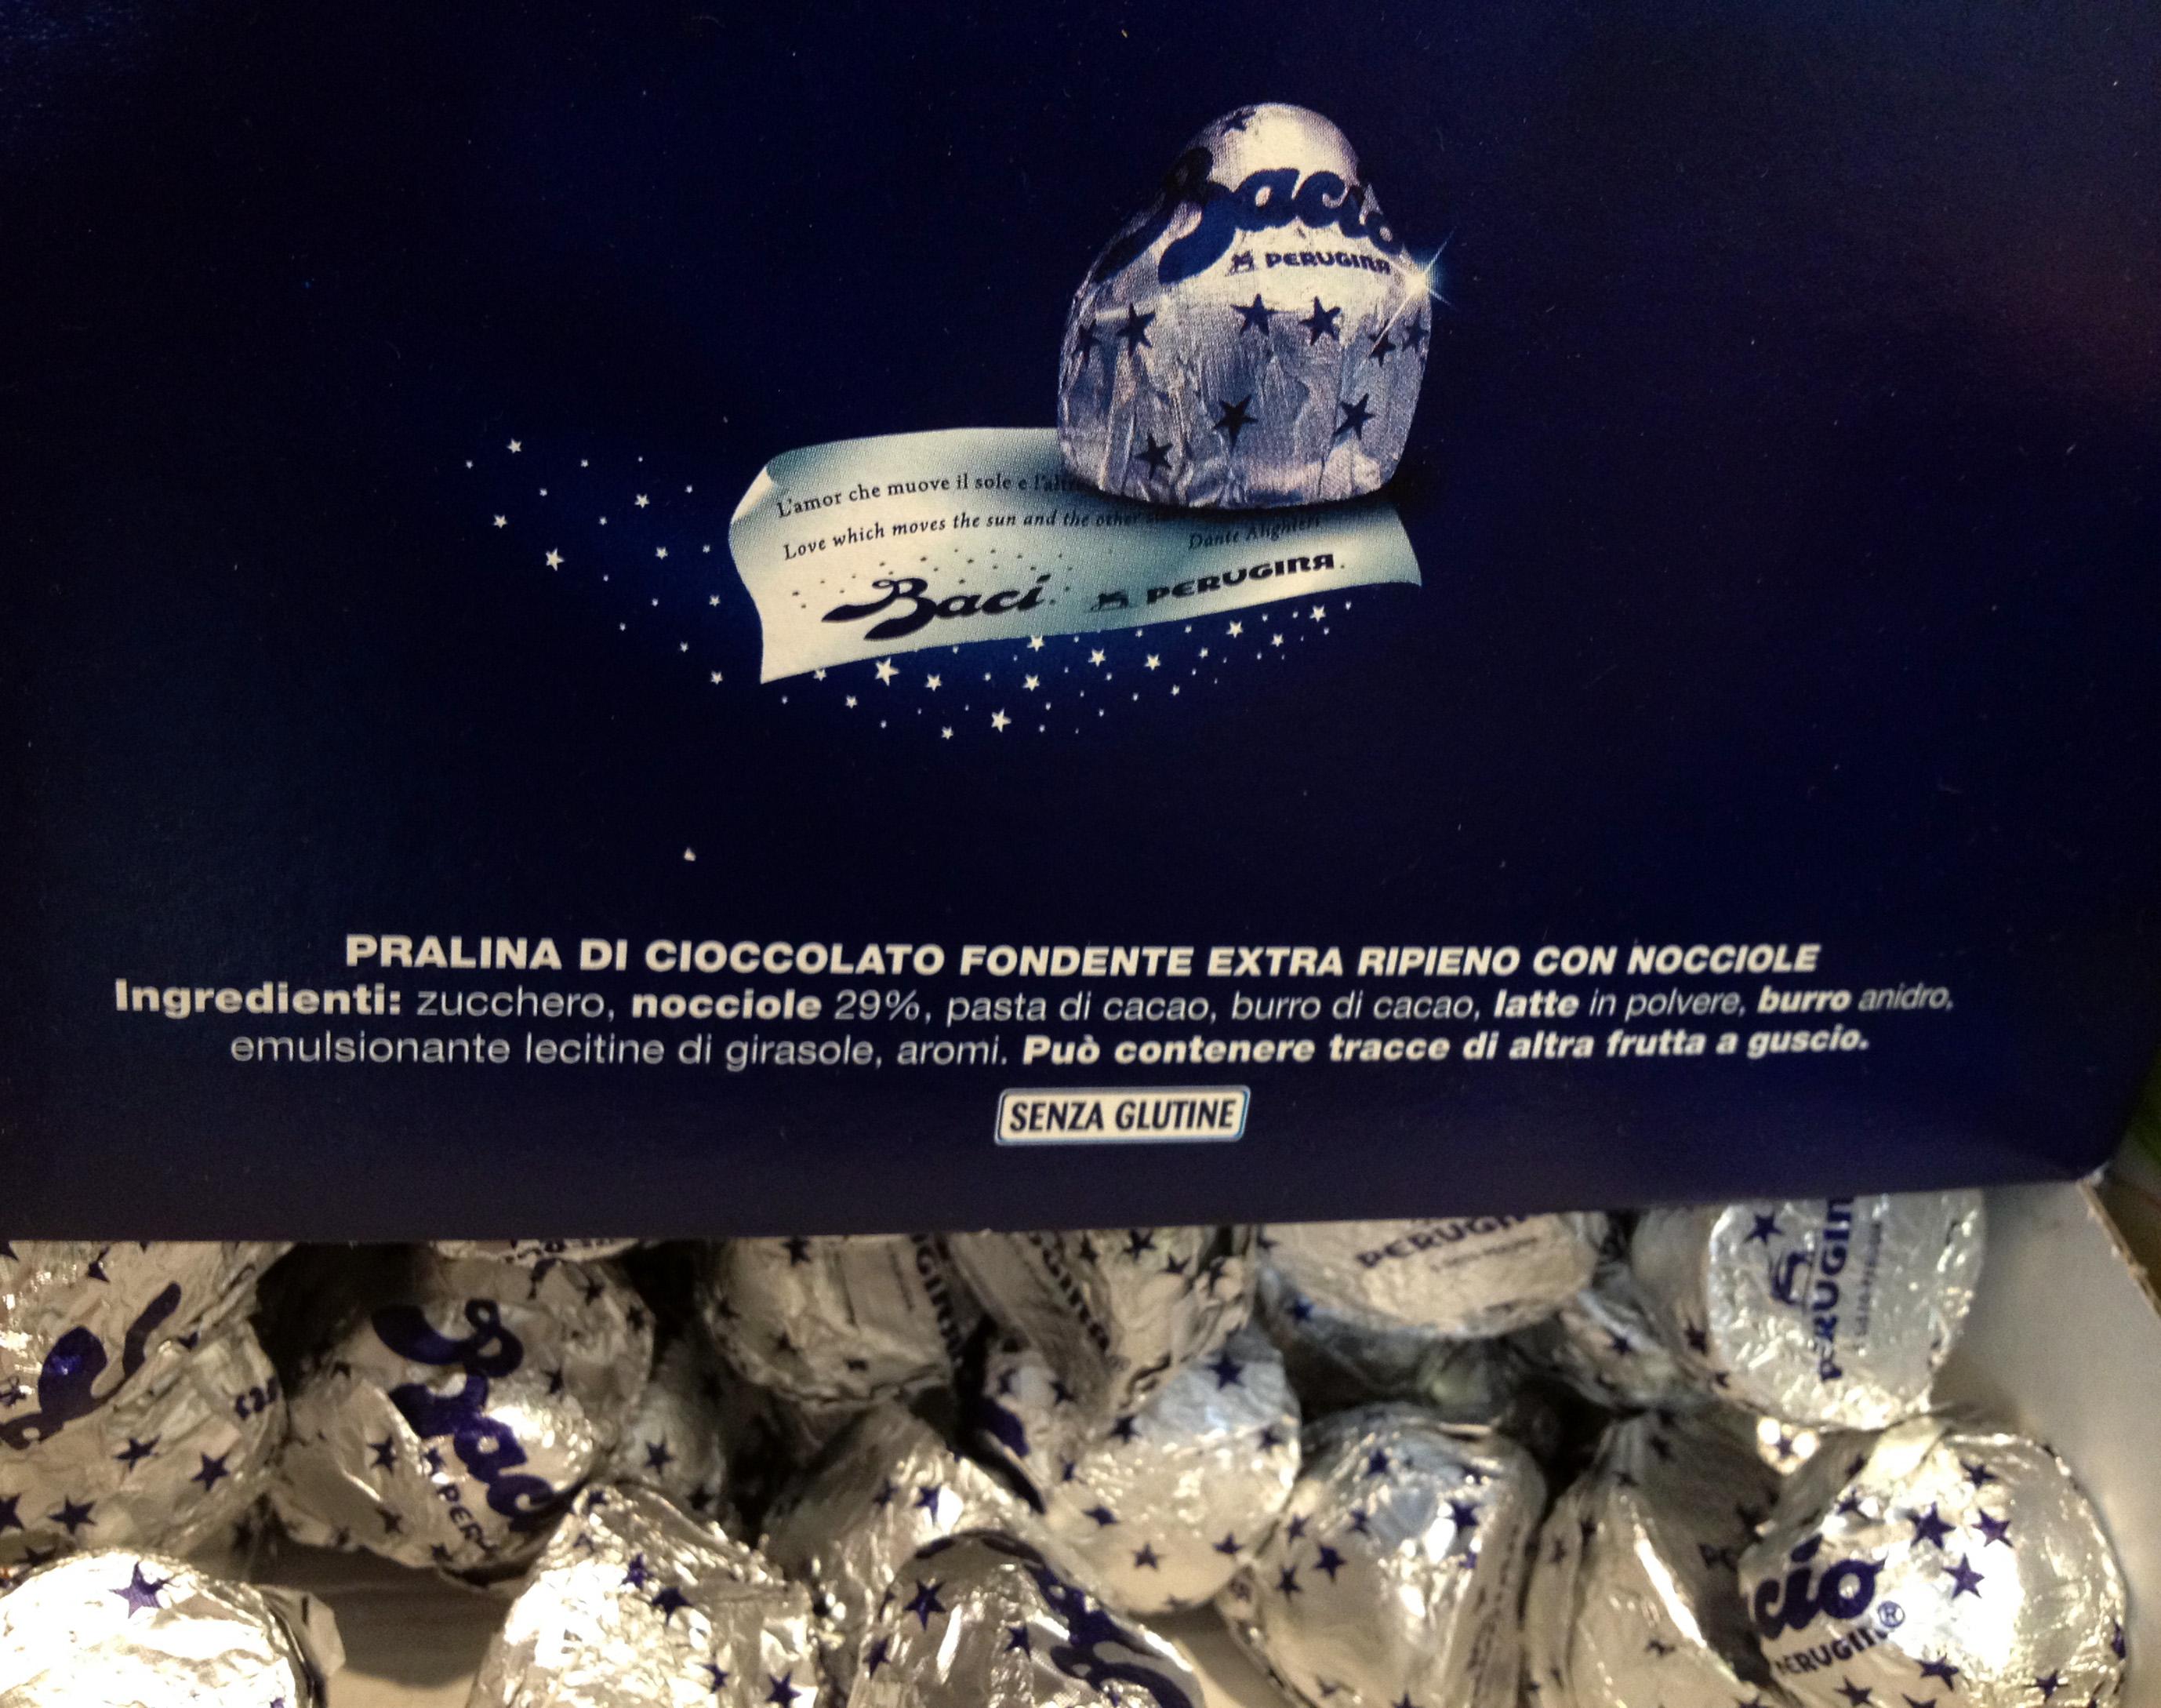 Baci Perugina gluten free chocolate